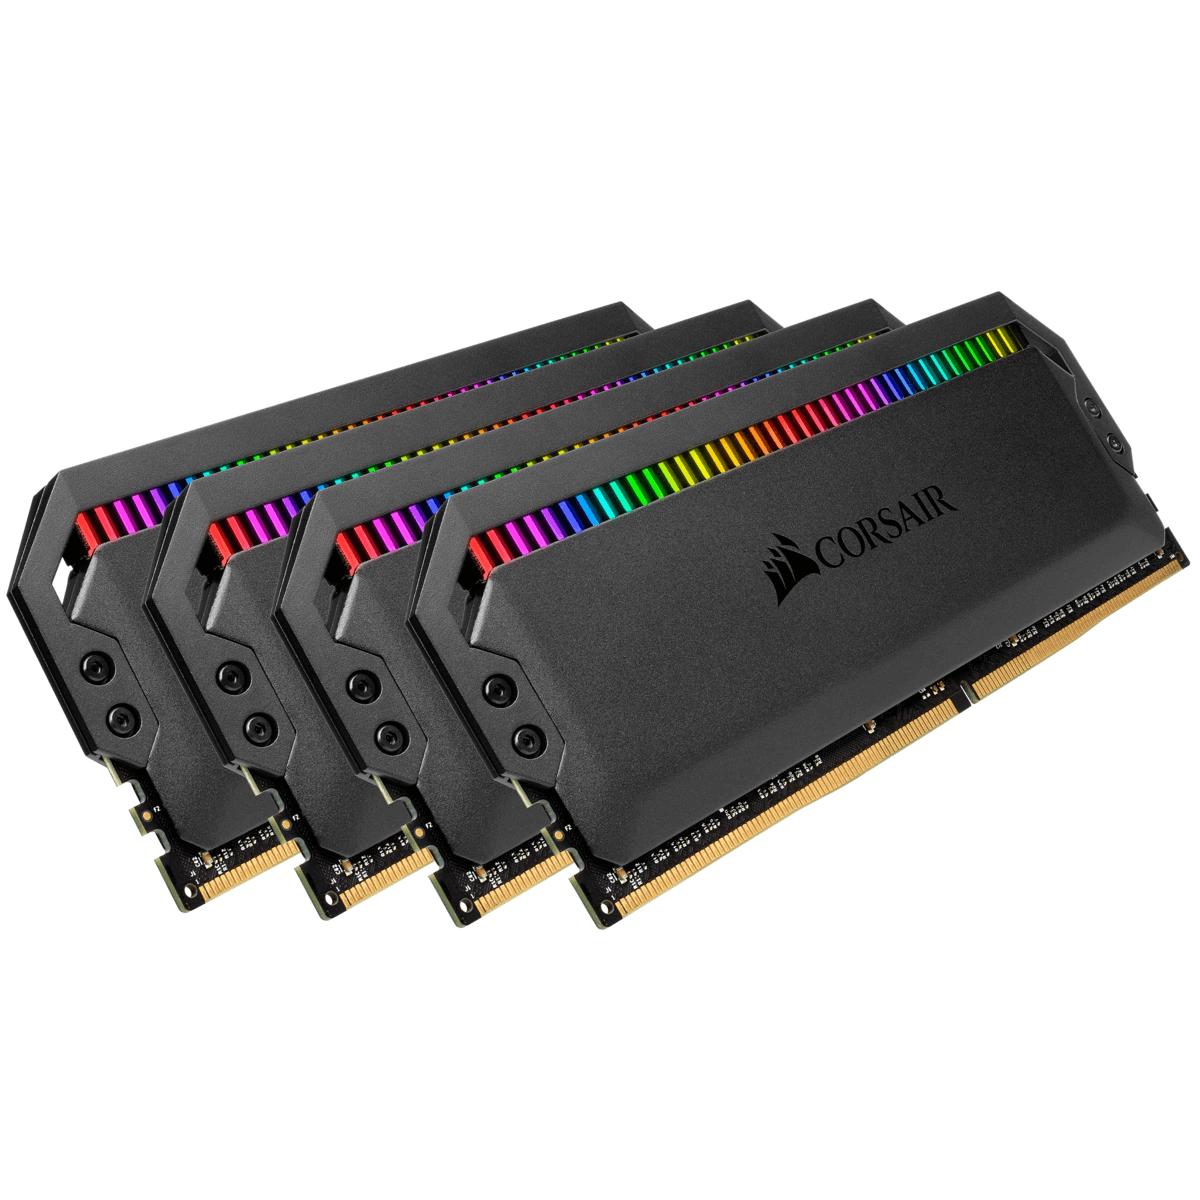 Memória DDR4 Corsair Dominator Platinum RGB, 32GB (4x8GB), 3600MHz, CMT32GX4M4C3600C18